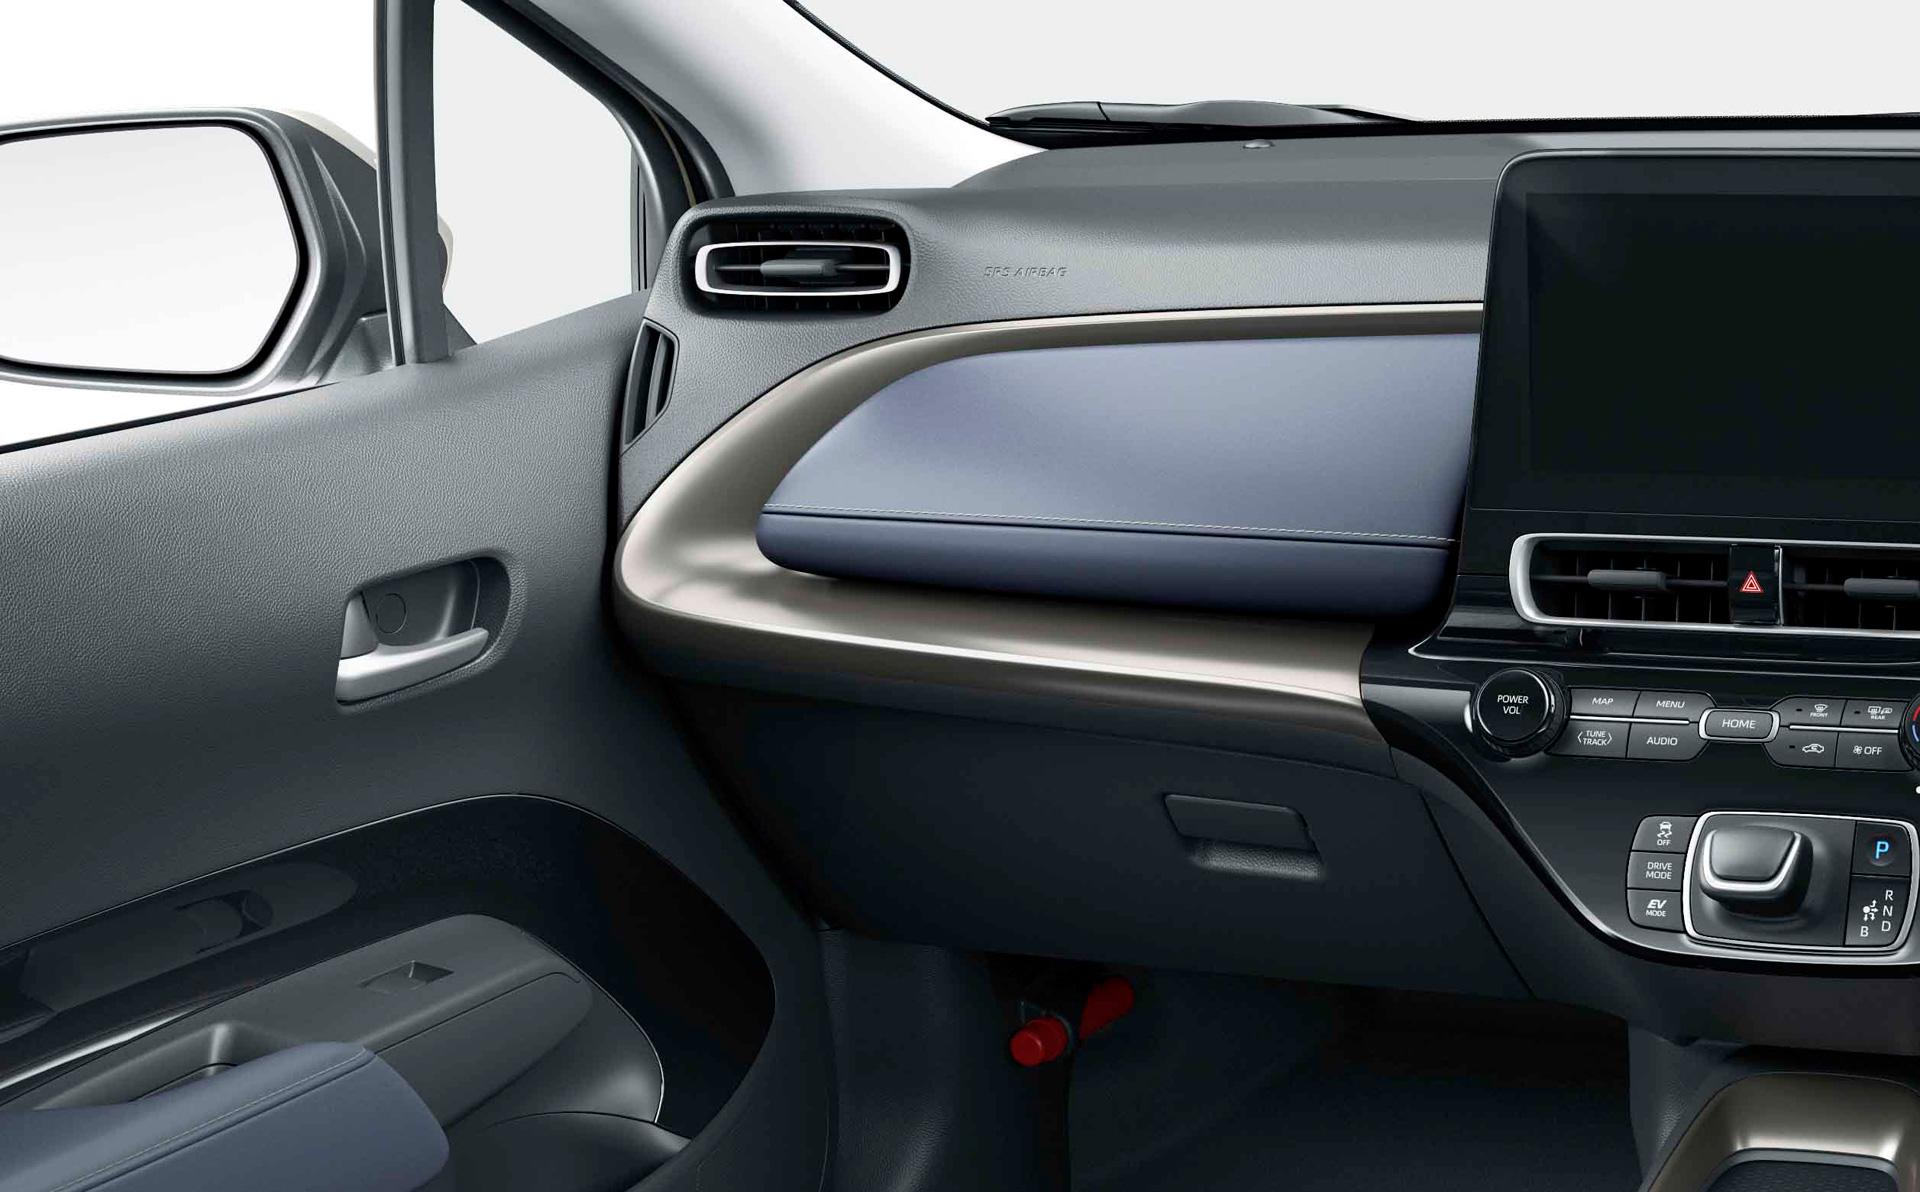 Toyota to Launch All-New Aqua - Image 2